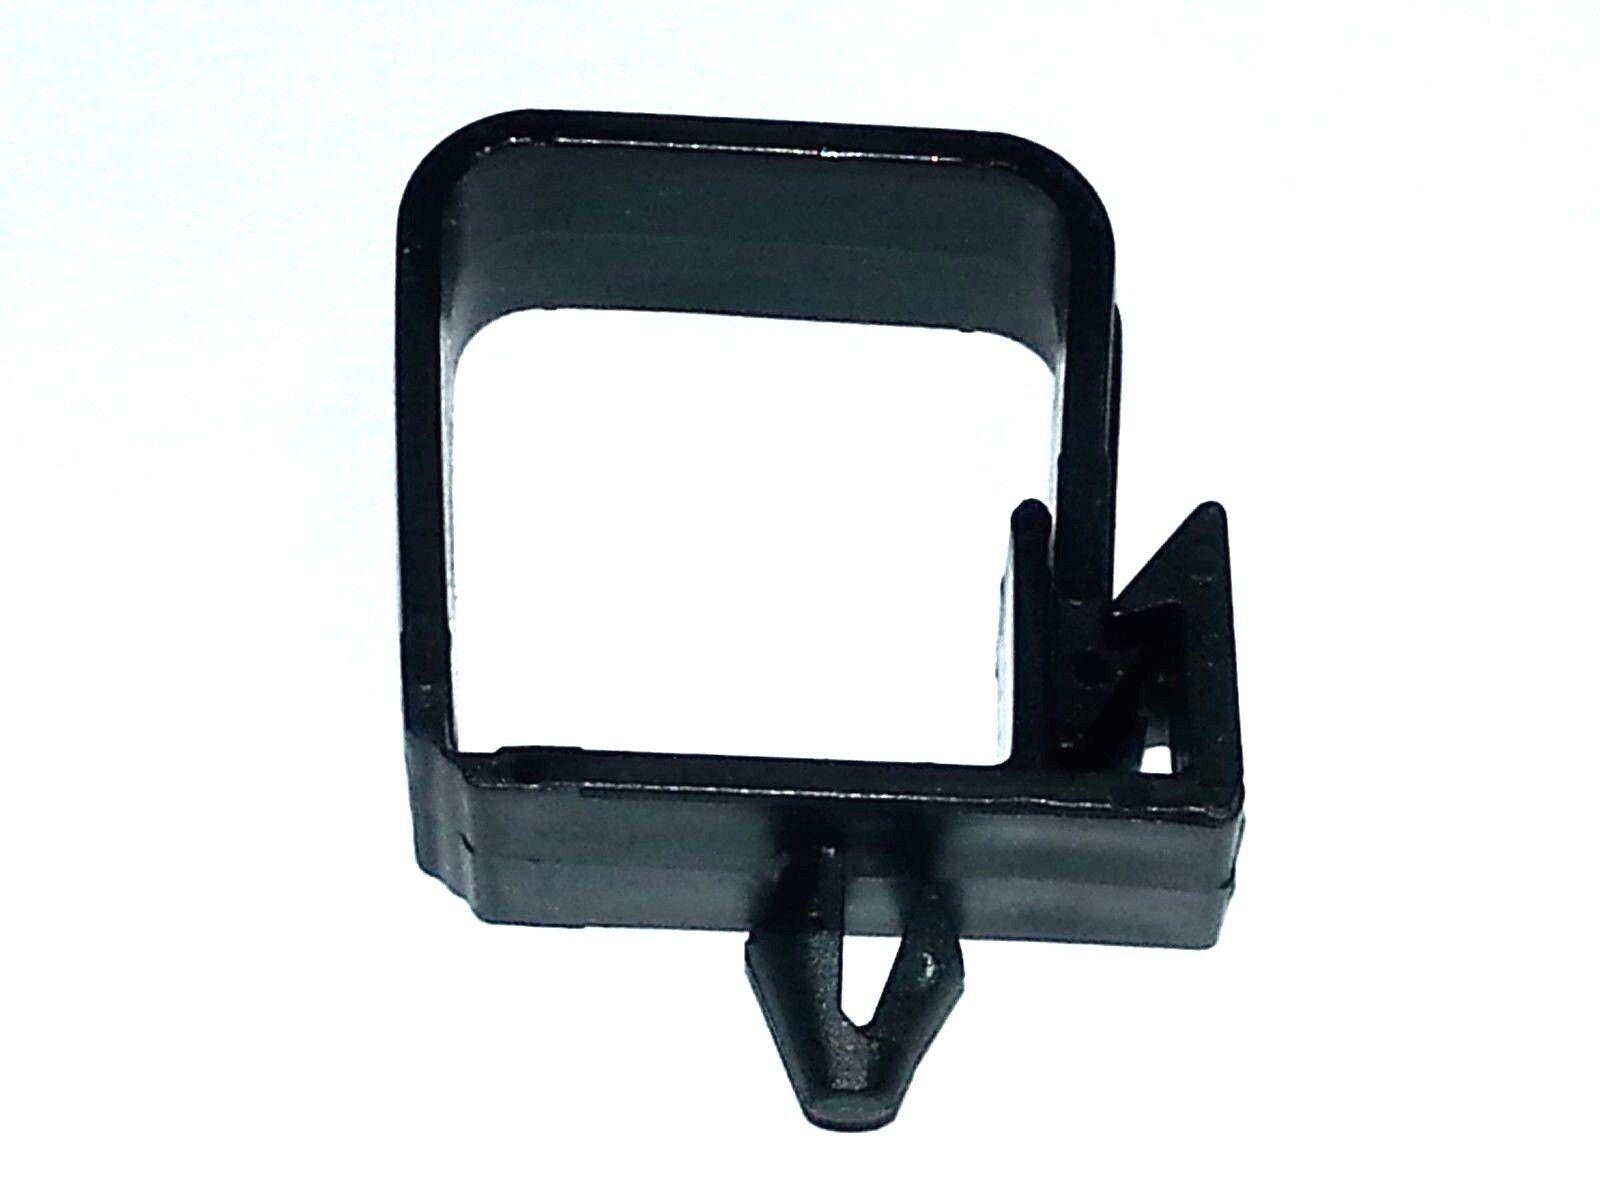 75-81 Firebird Trans Am Headlight Wiring Harness Radiator Retainer Strap Clip 1p